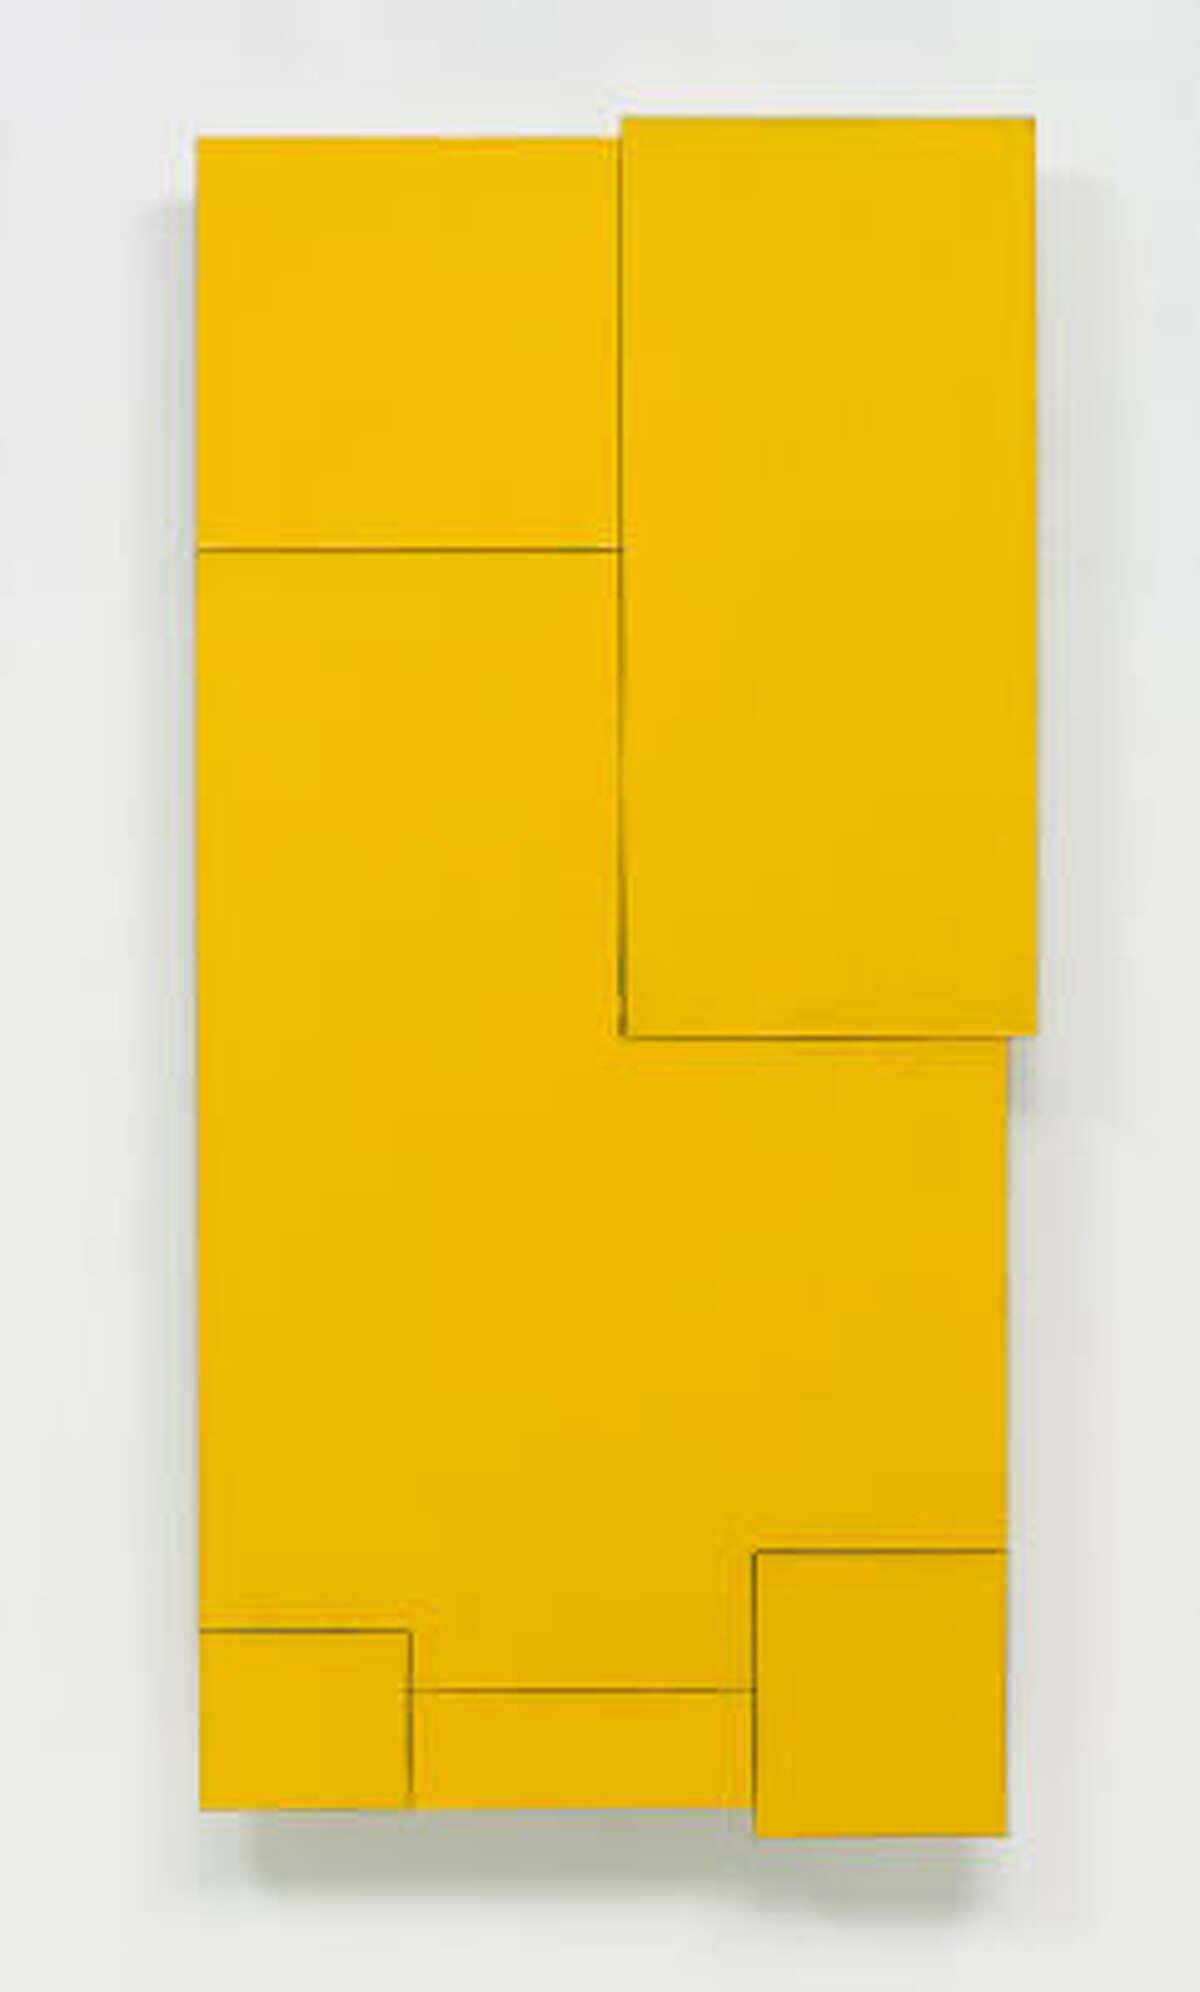 Sam Gilliam's On Yellow Wood (2003)